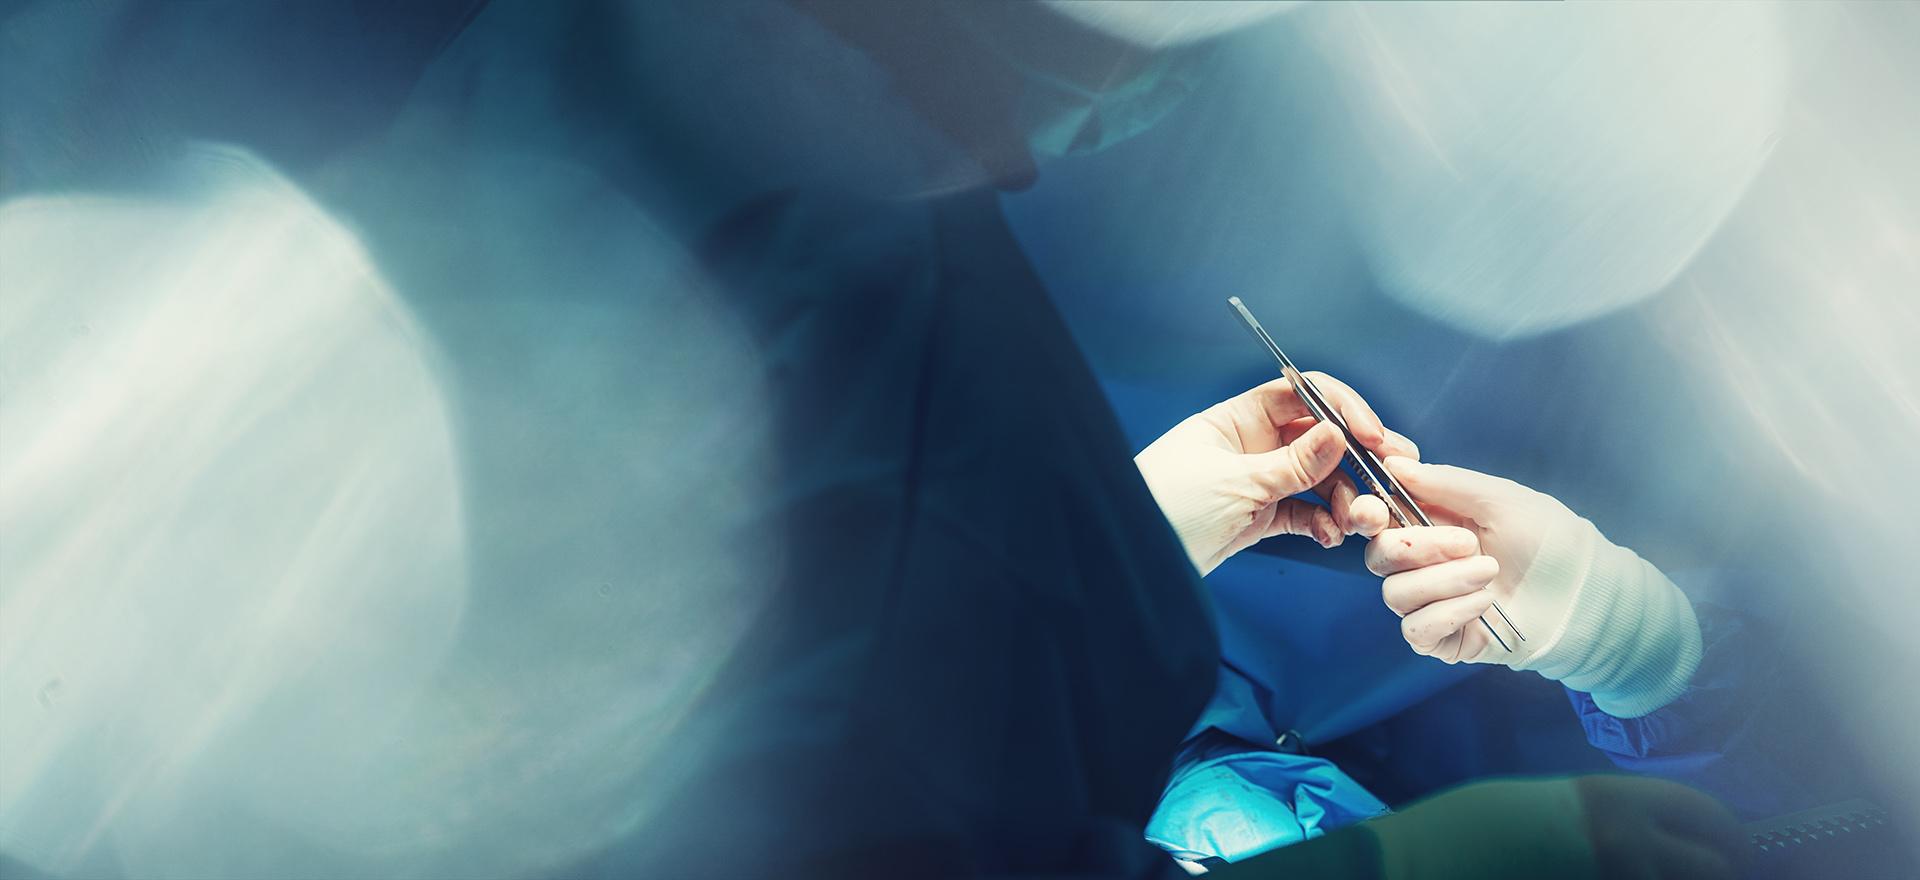 Photo of Rock Hill SC Medical Malpractice Claim